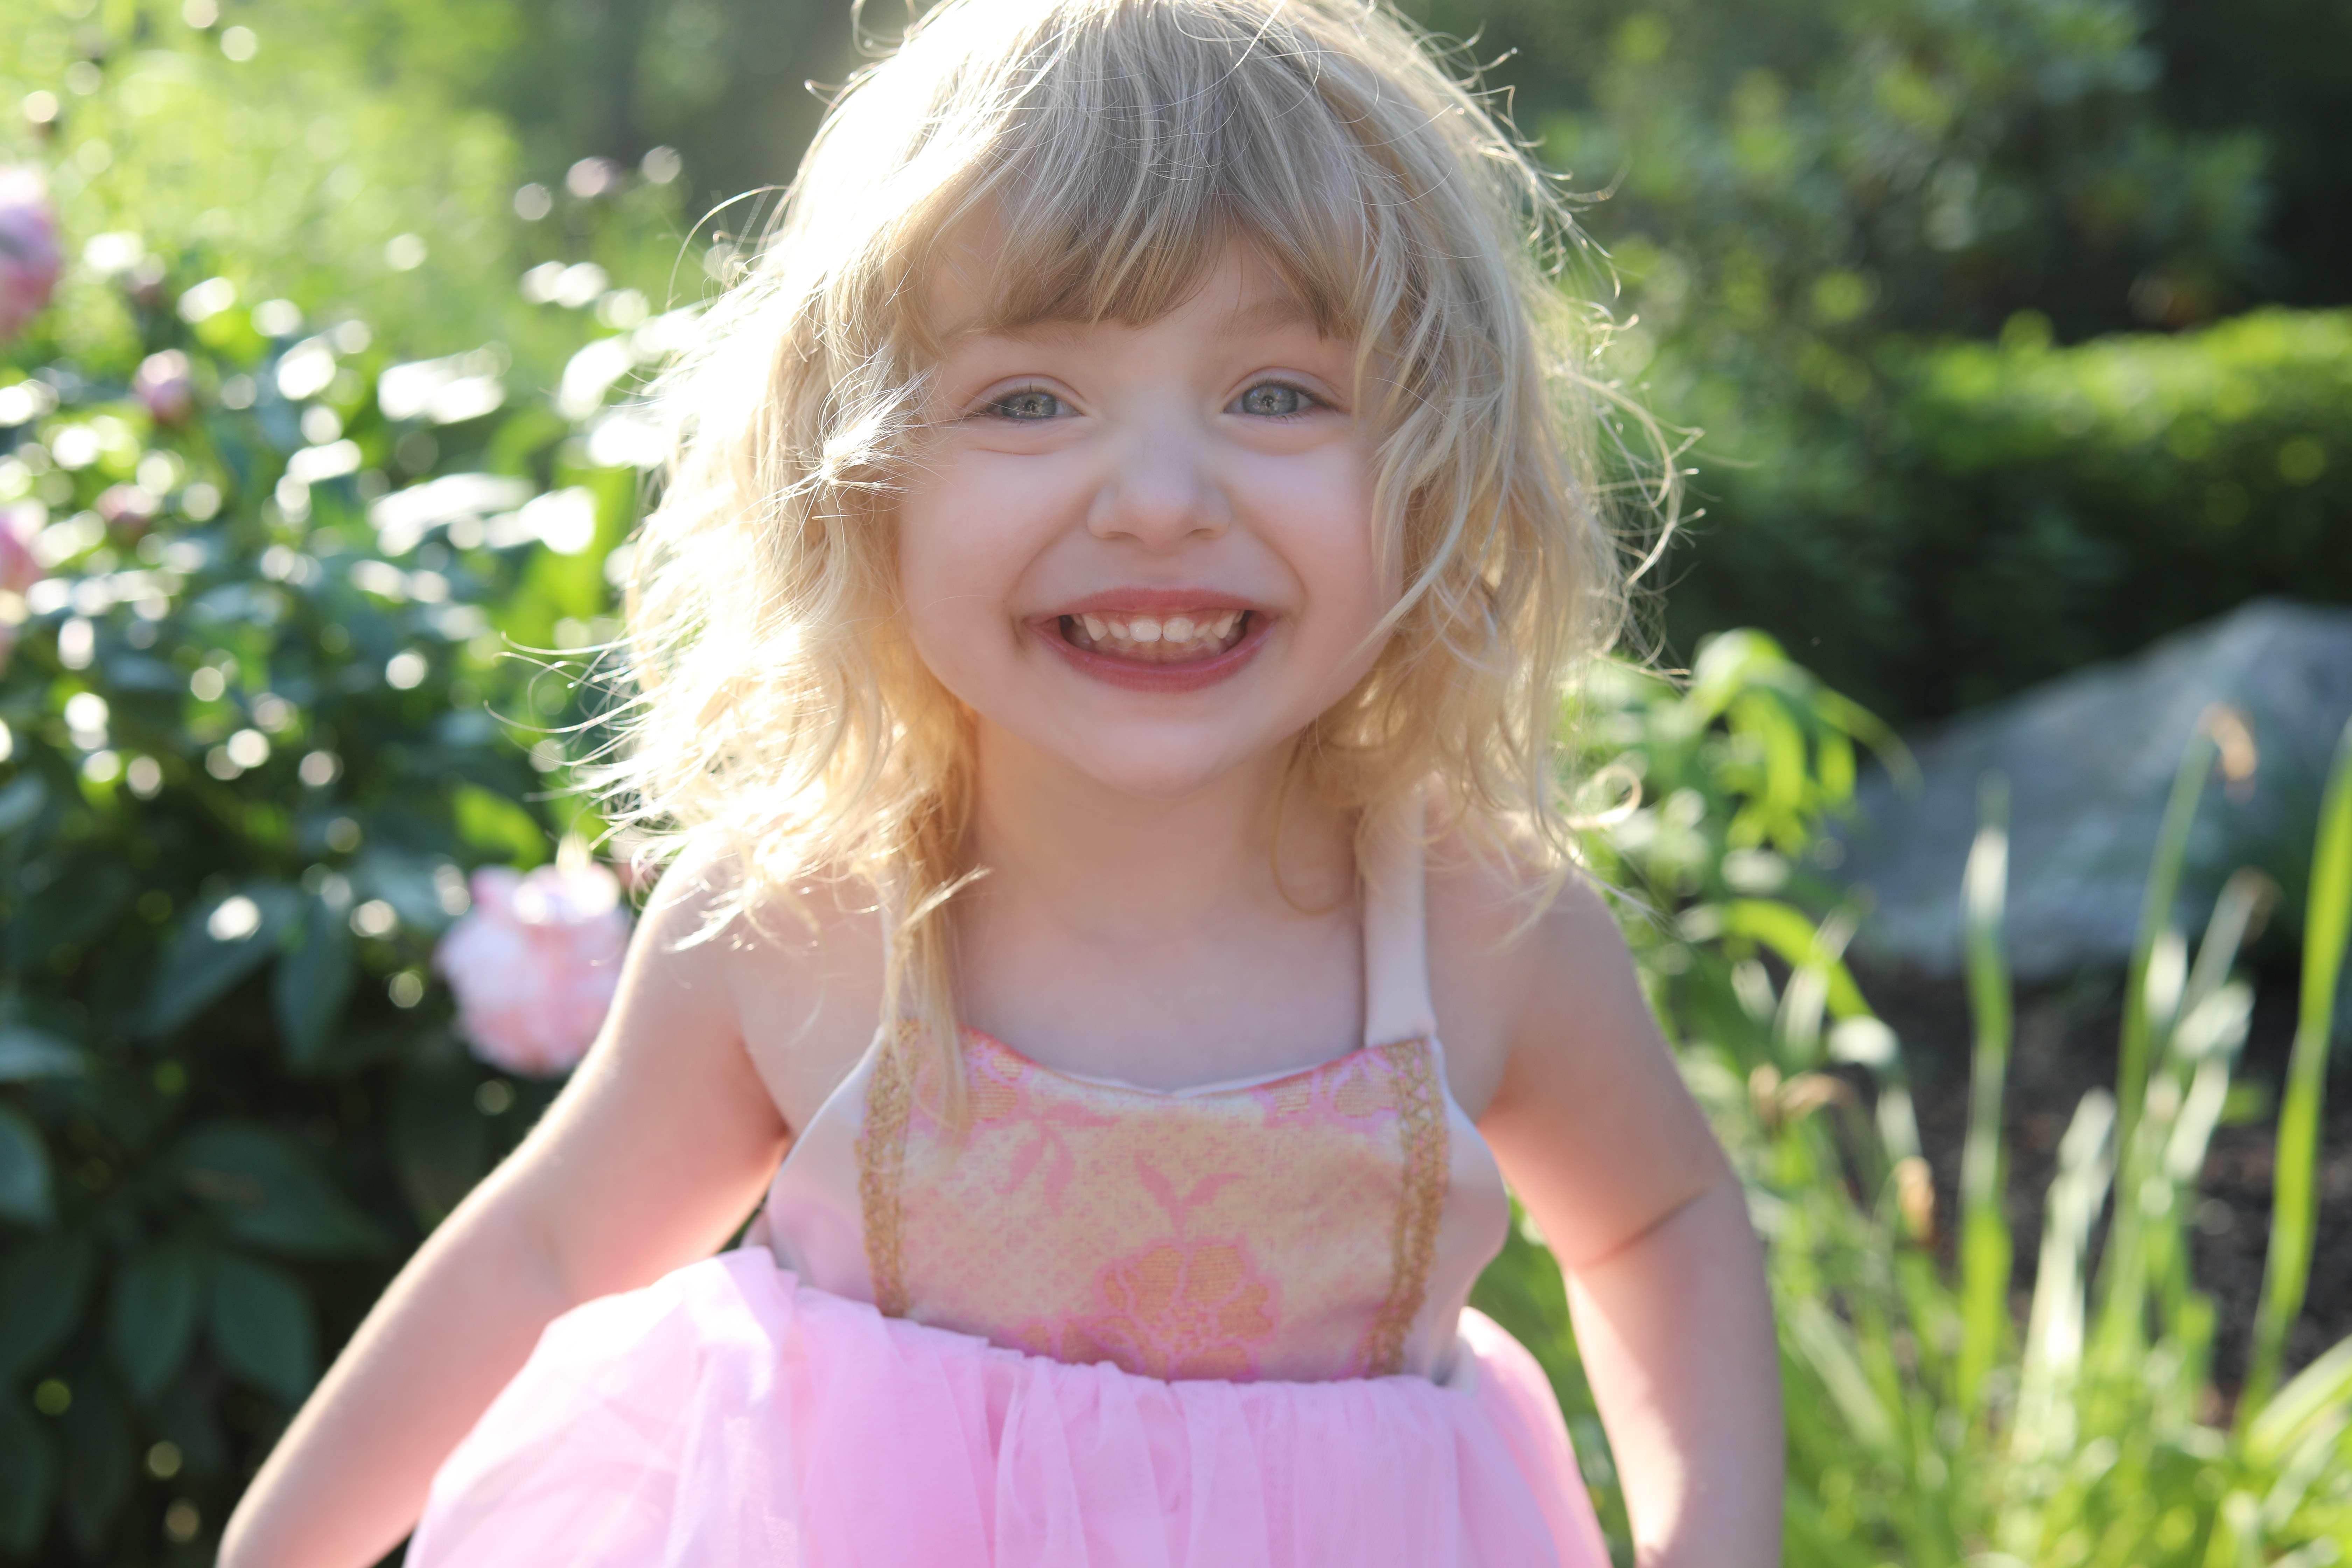 – 6 b Children photographer family portrait katherine eastman photography miami south florida fairytale beauty chagrin falls ohio atlanta